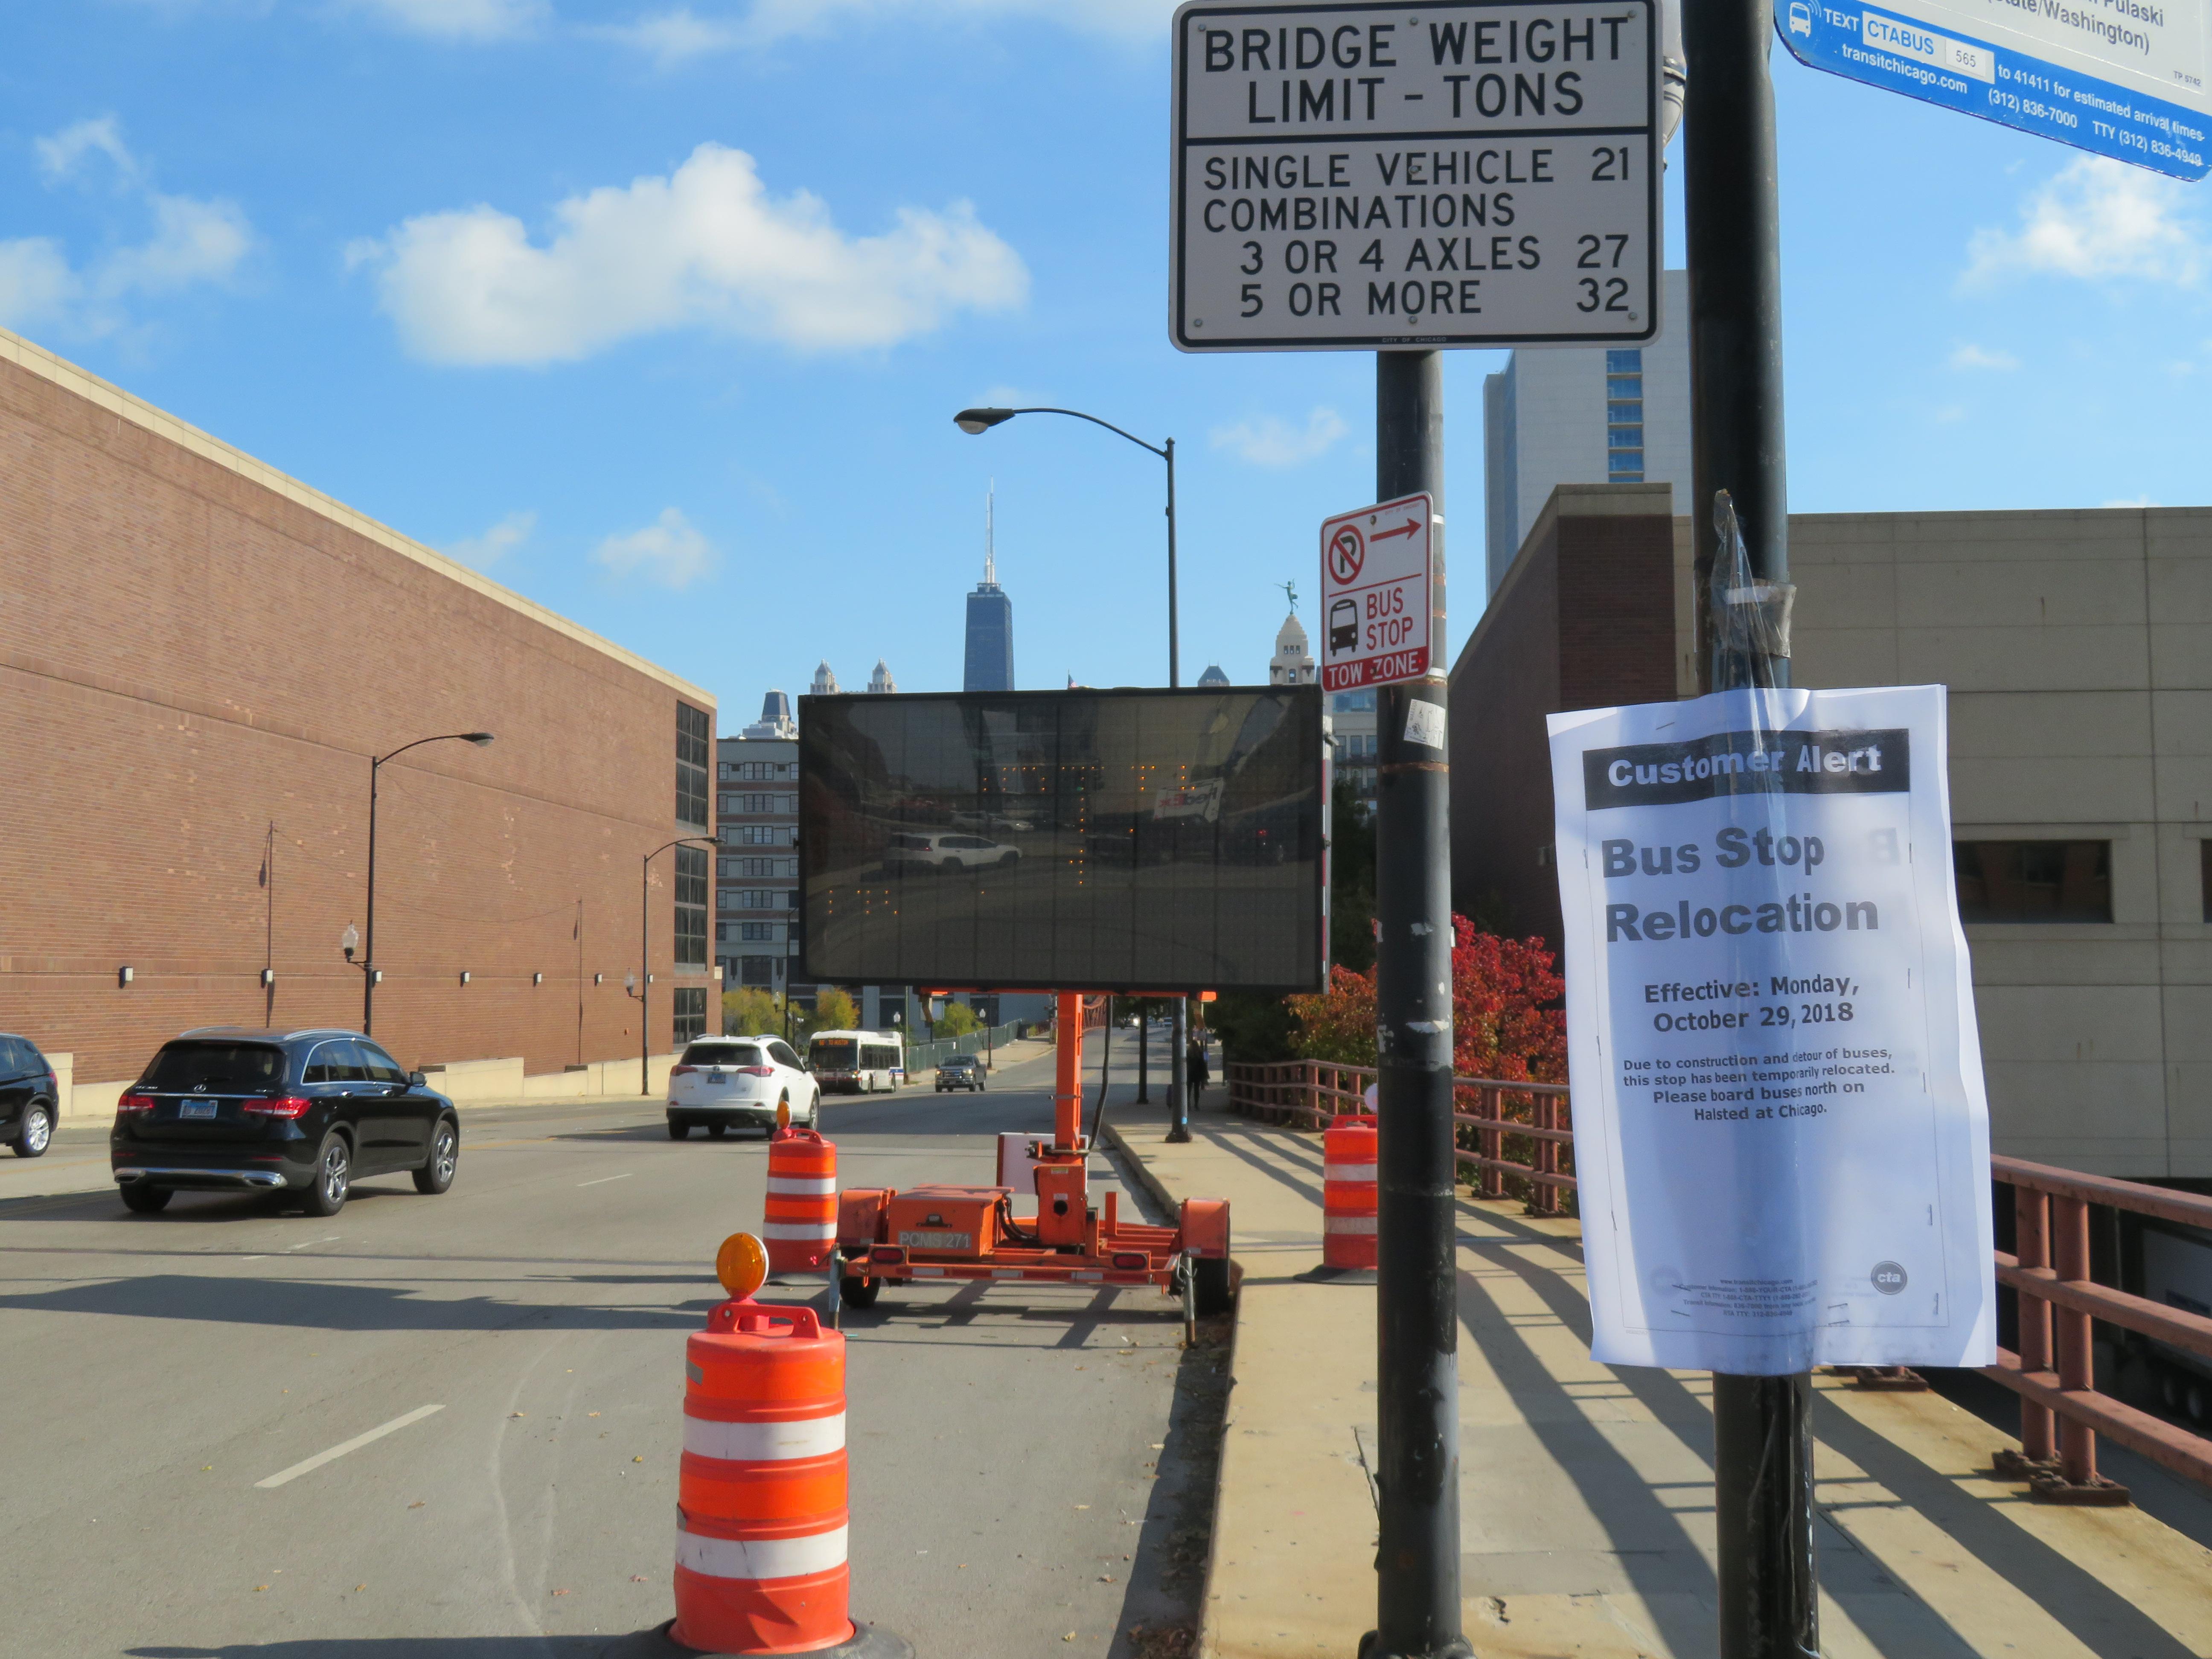 Chicago Avenue bridge will close Thursday for demolition, reconstruction